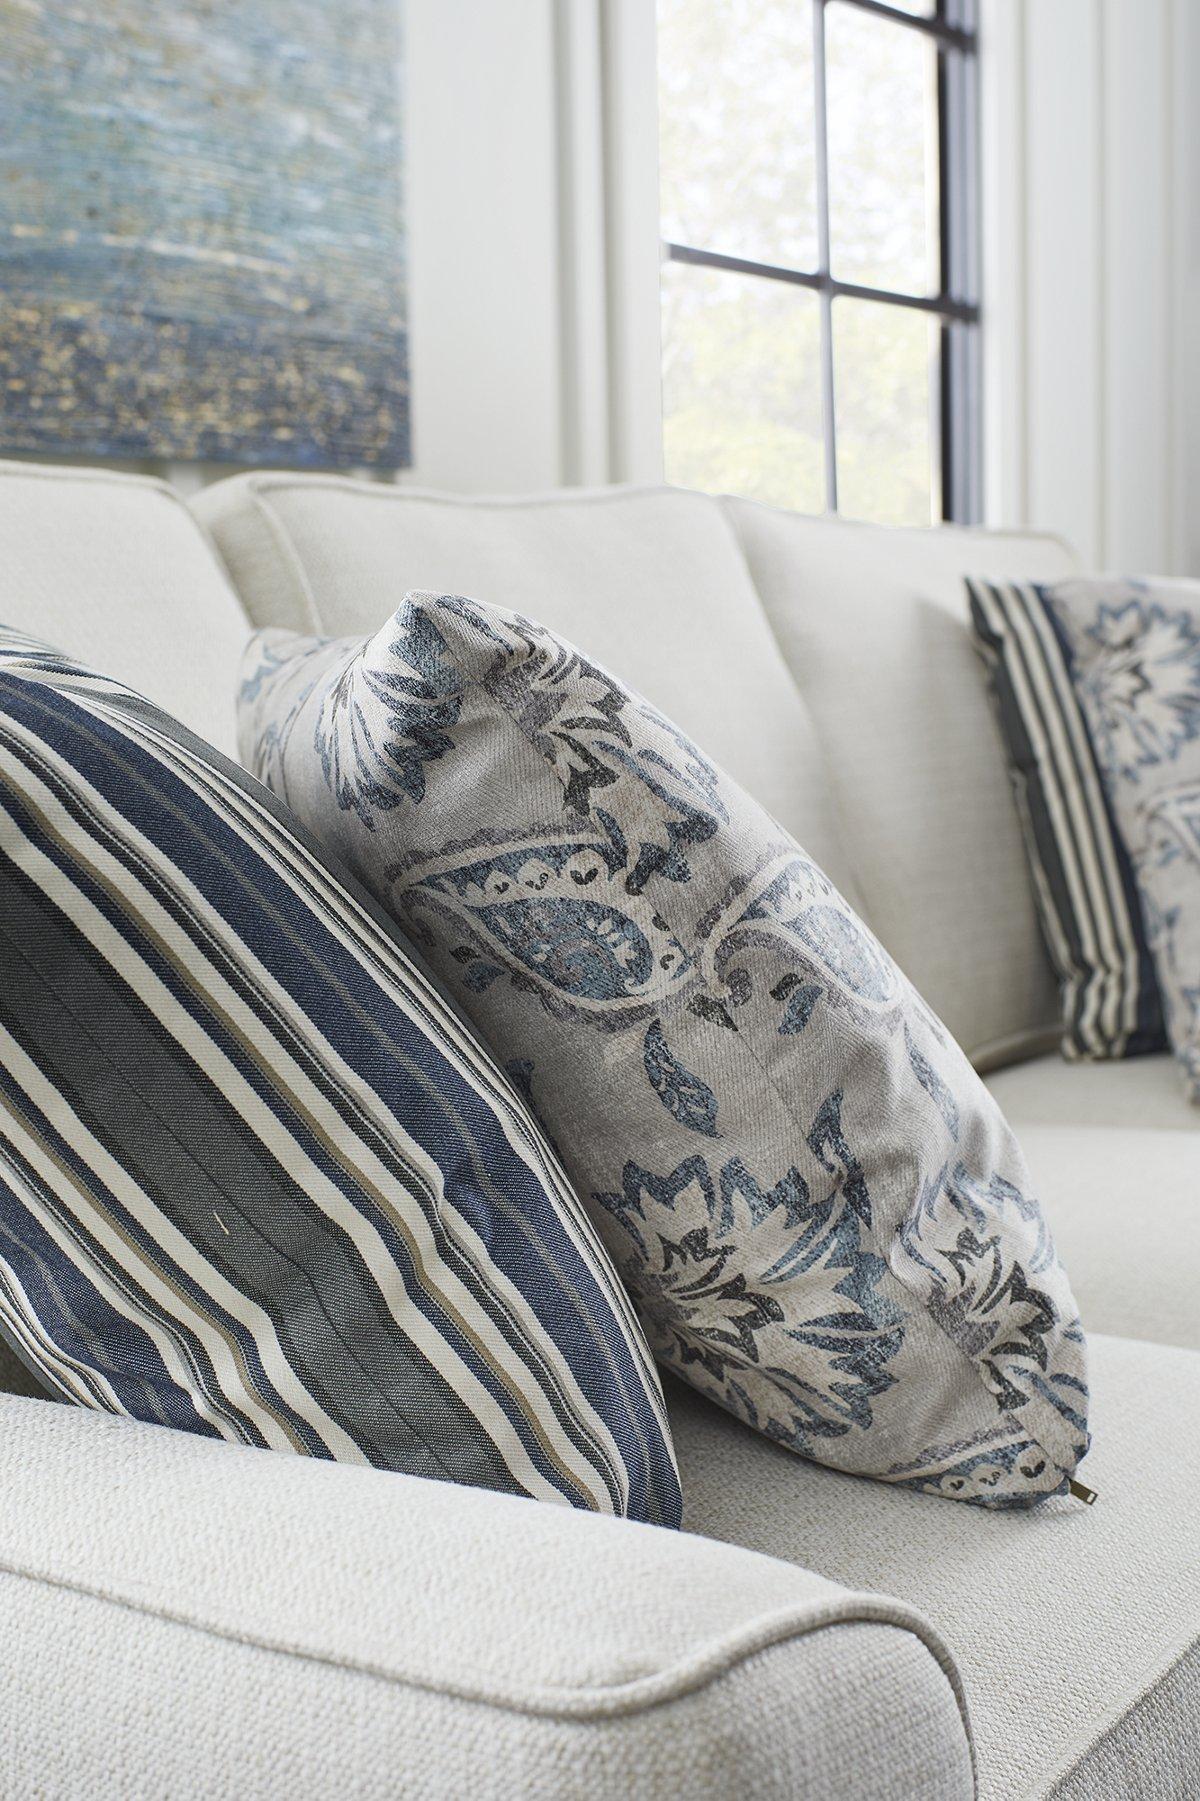 Amuse Blue Fabric Square Accent Pillow